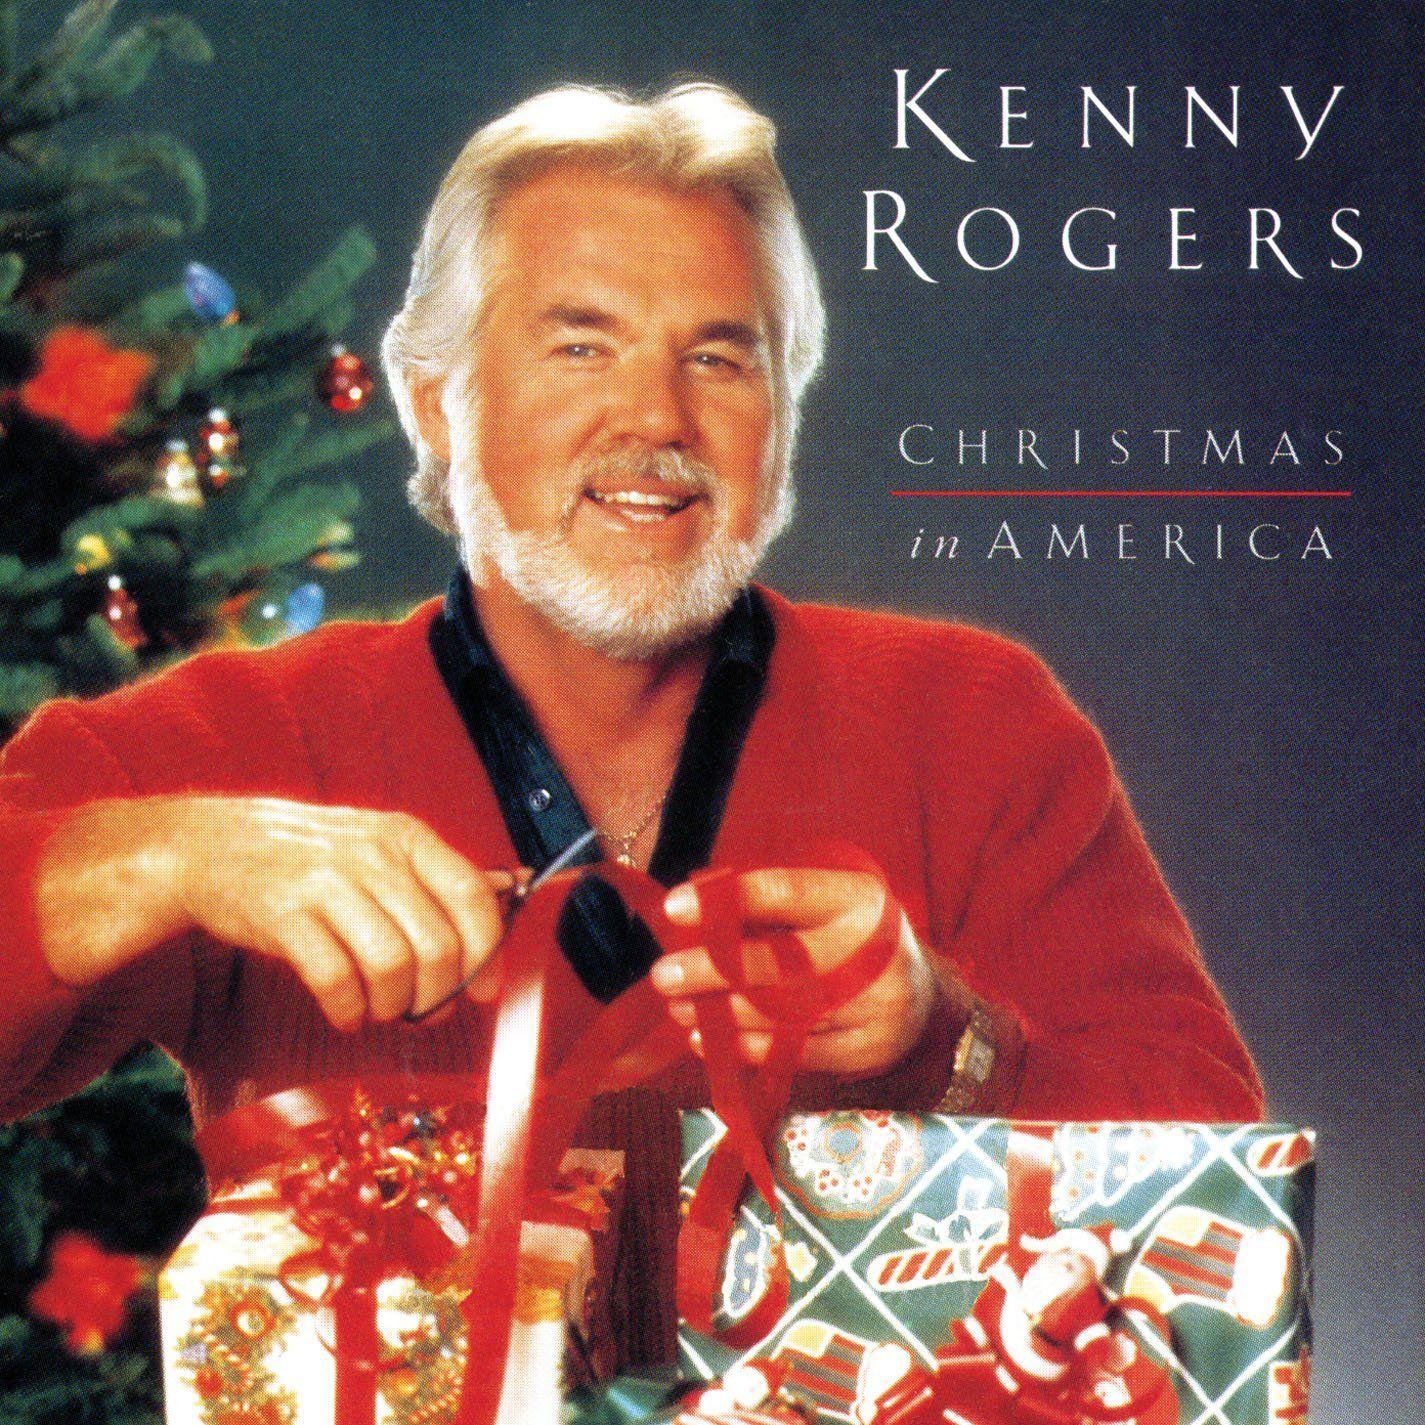 Christmas In America [1989] Christmas in america